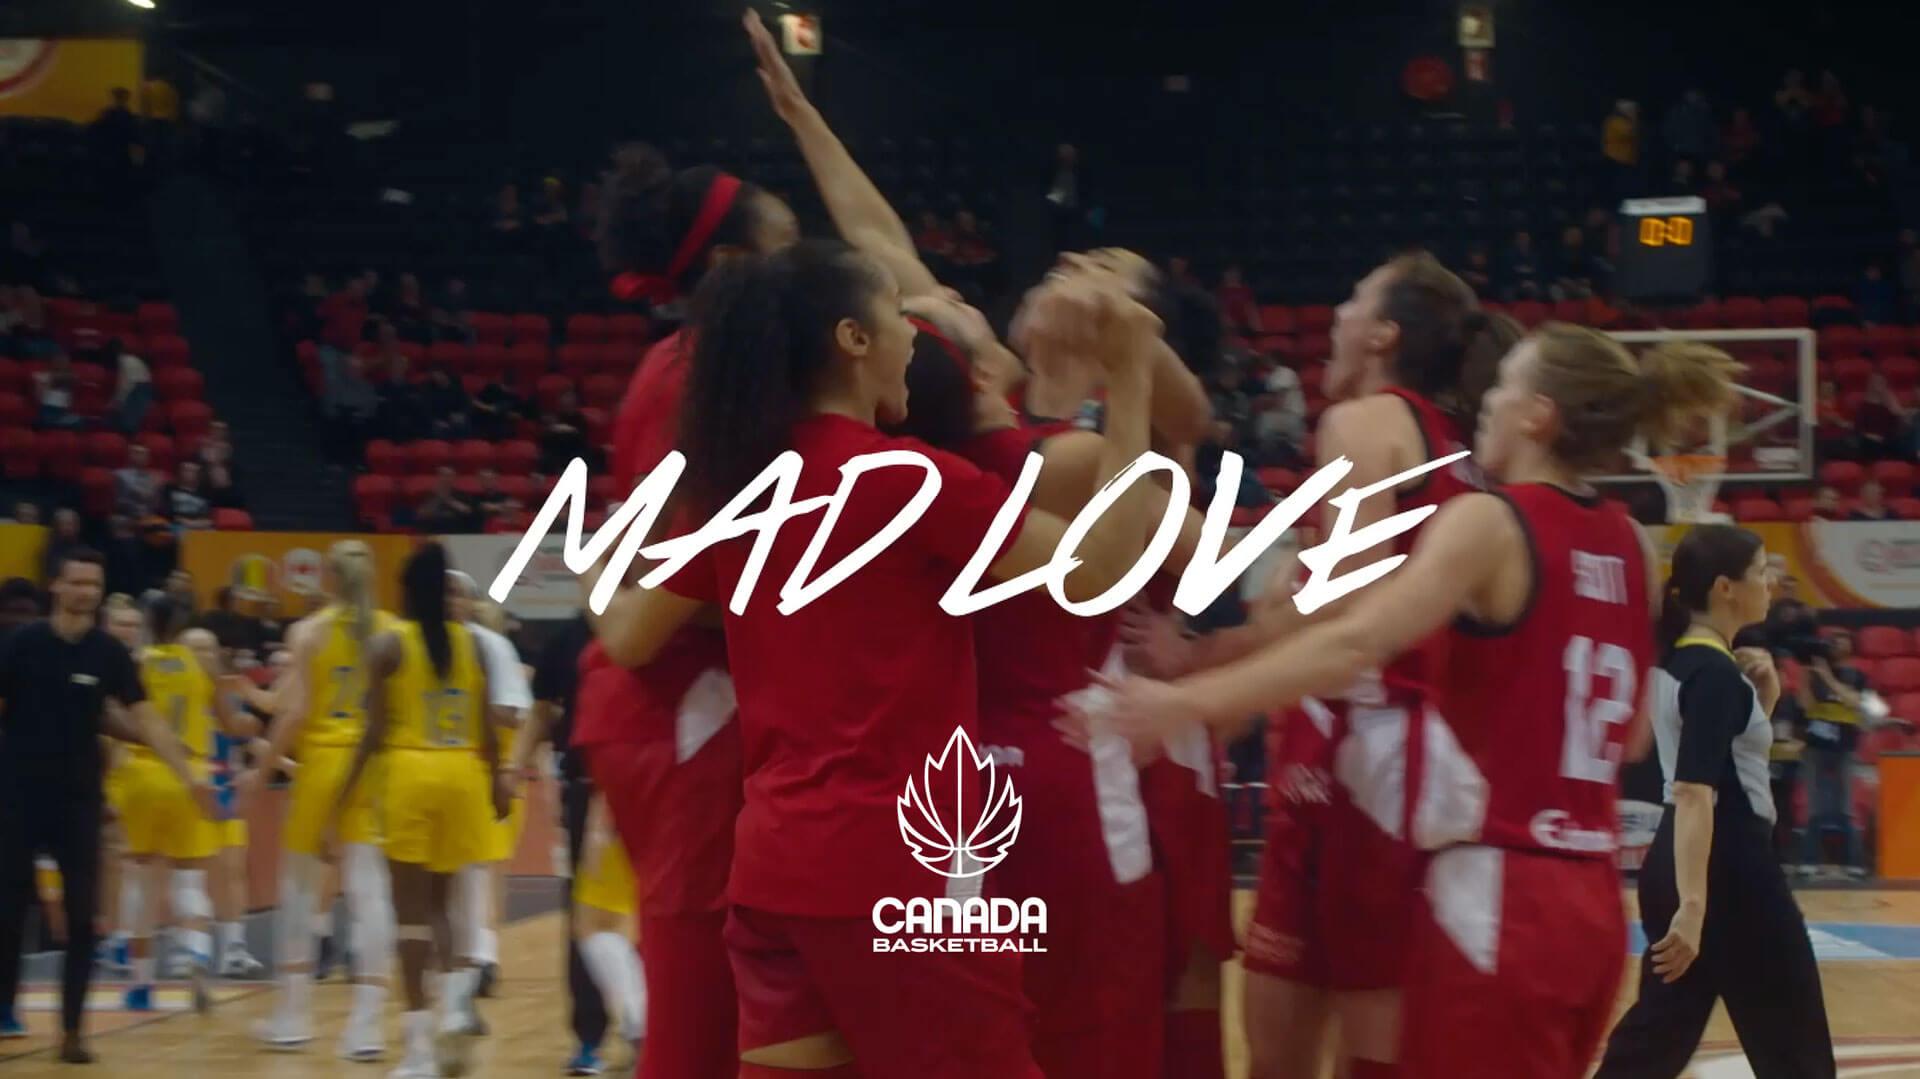 Mad Love canadian women basketball team